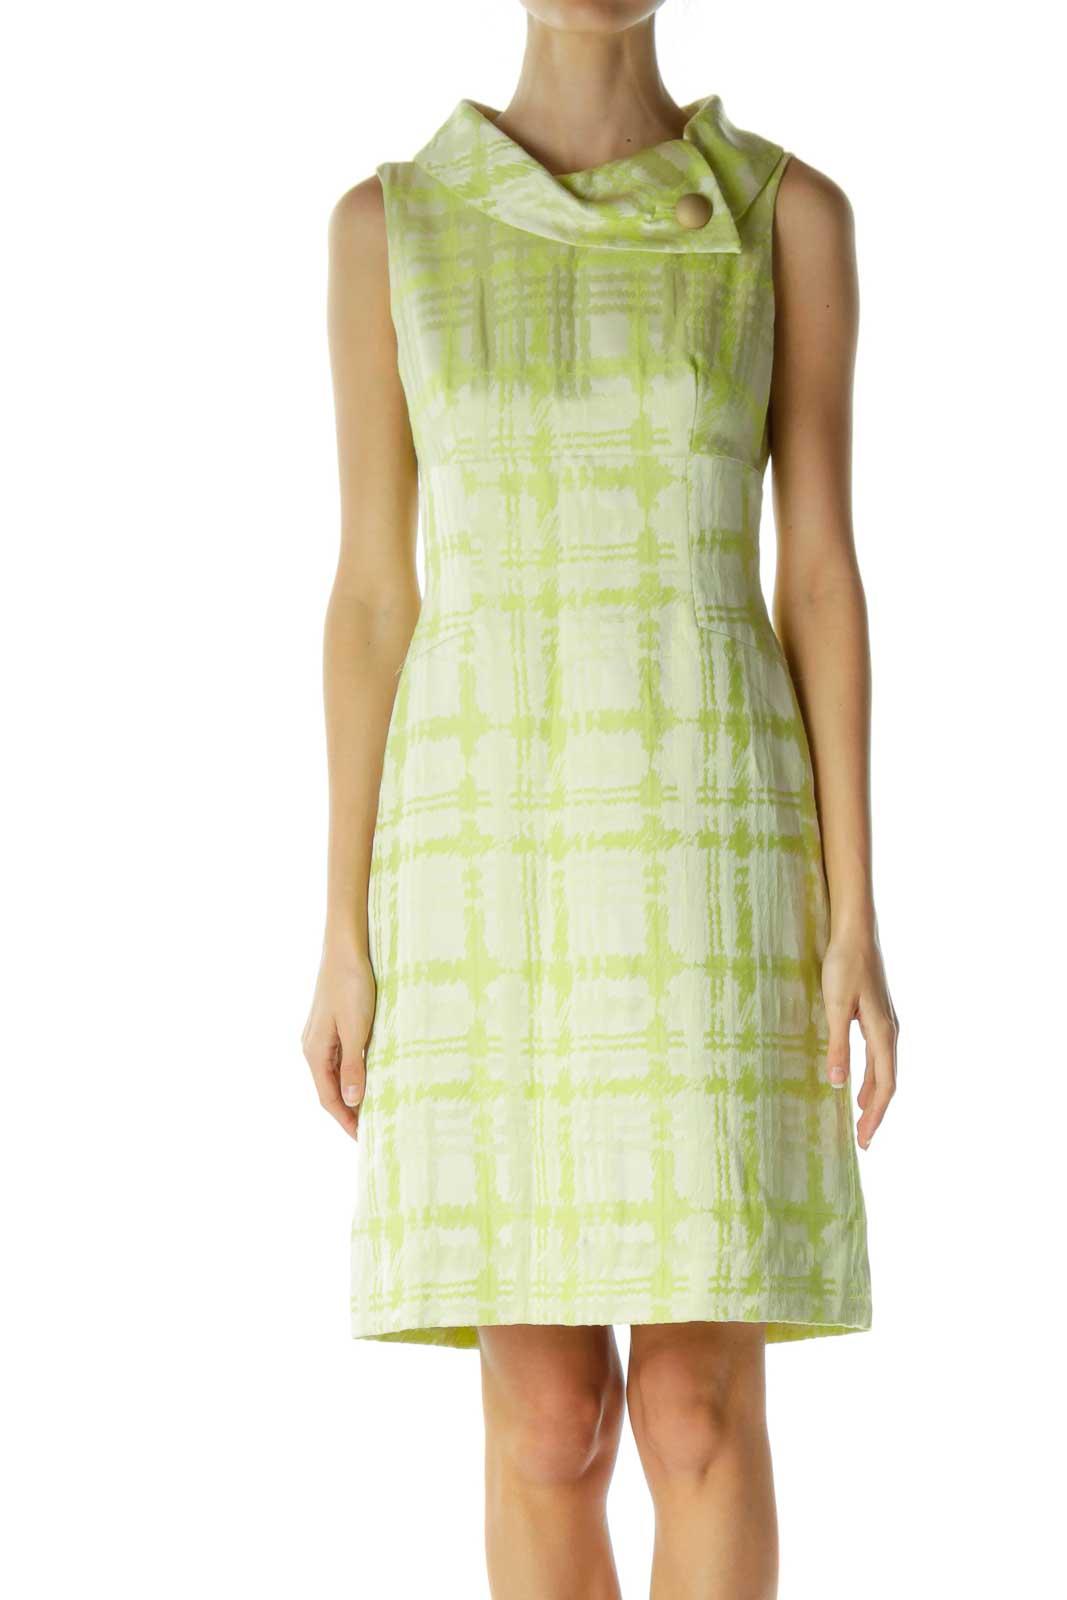 Green Cream High Neck Shiny Work Dress Front